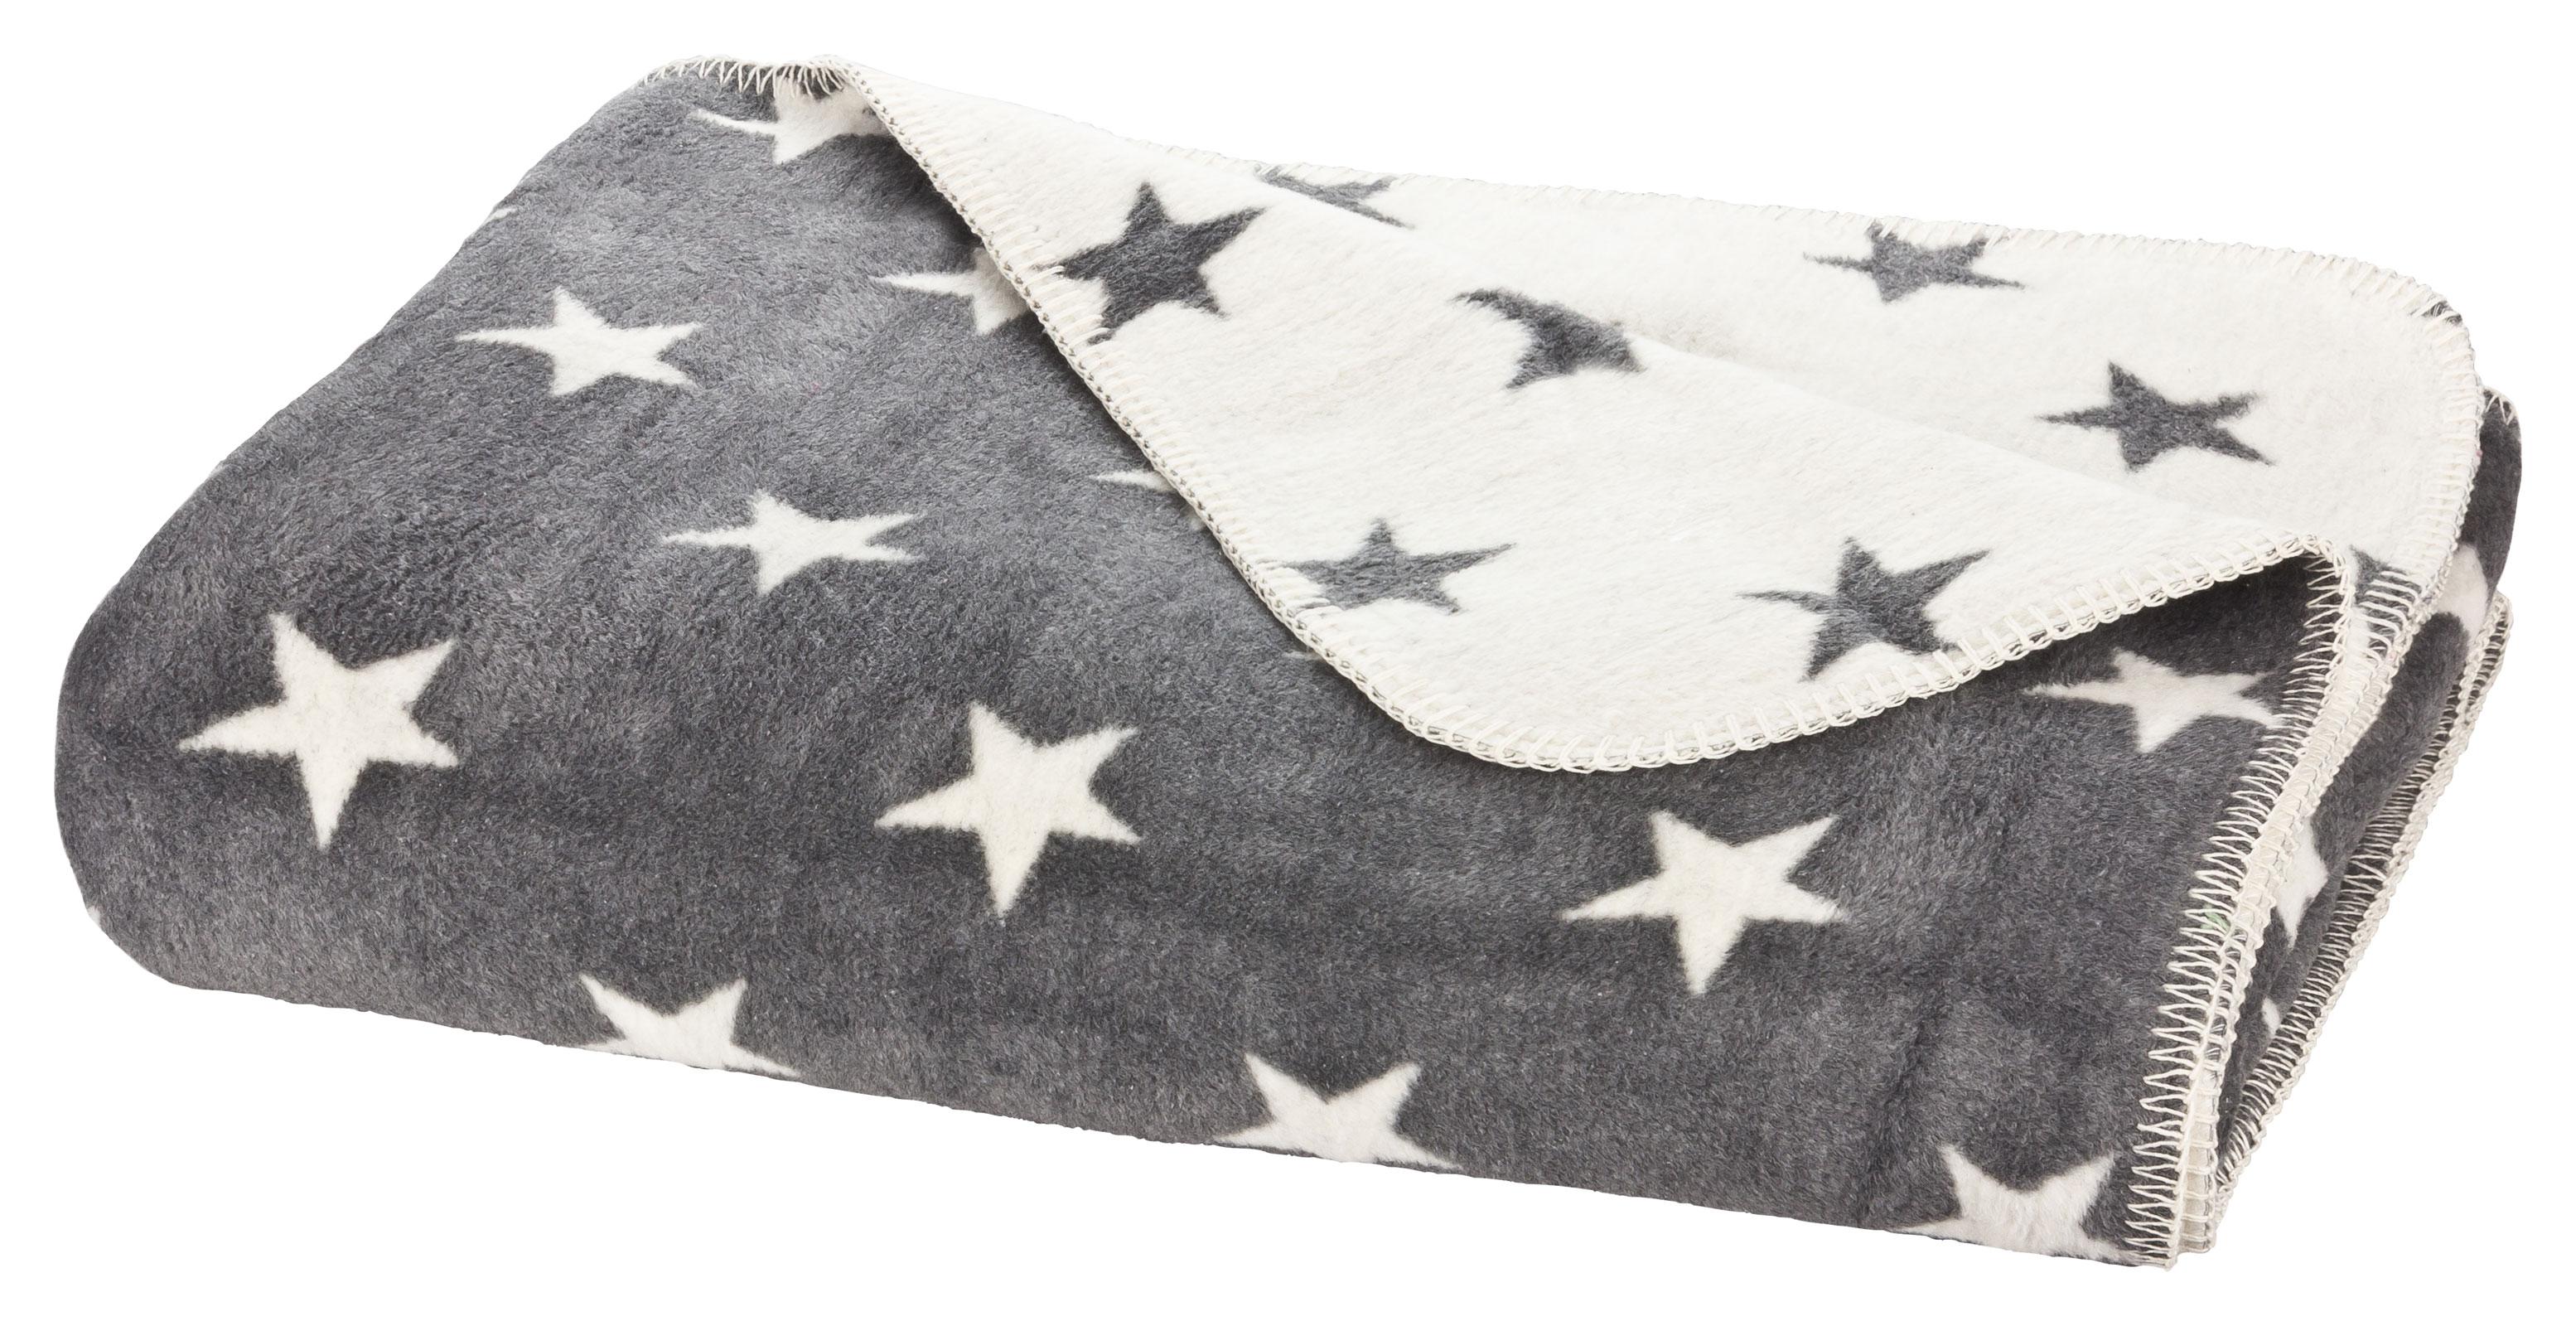 moon luxus sterne wolldecke kuscheldecke 150x200 ebay. Black Bedroom Furniture Sets. Home Design Ideas